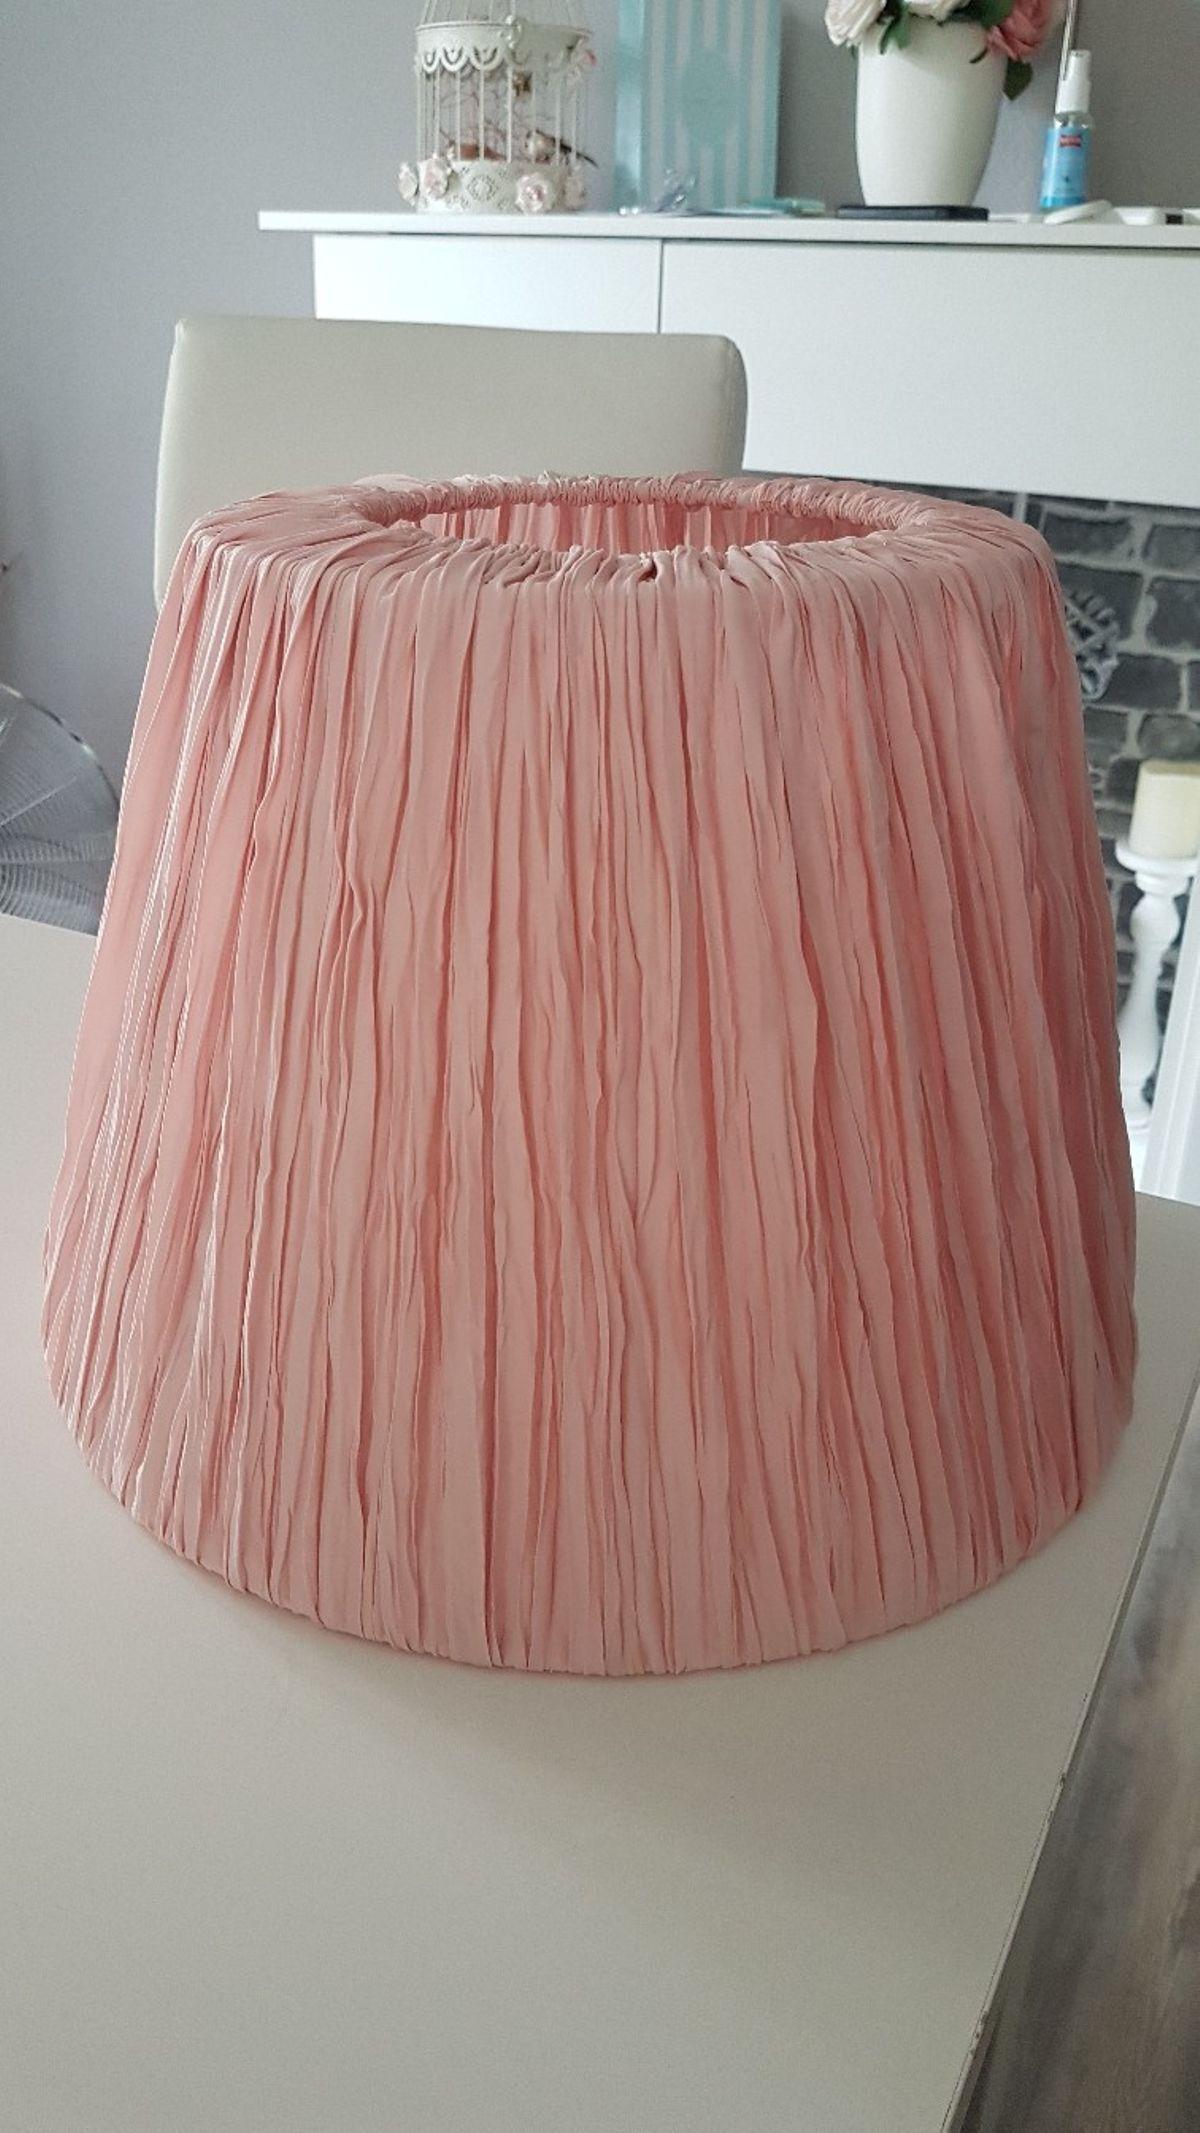 Lampenschirm Gestell Ikea